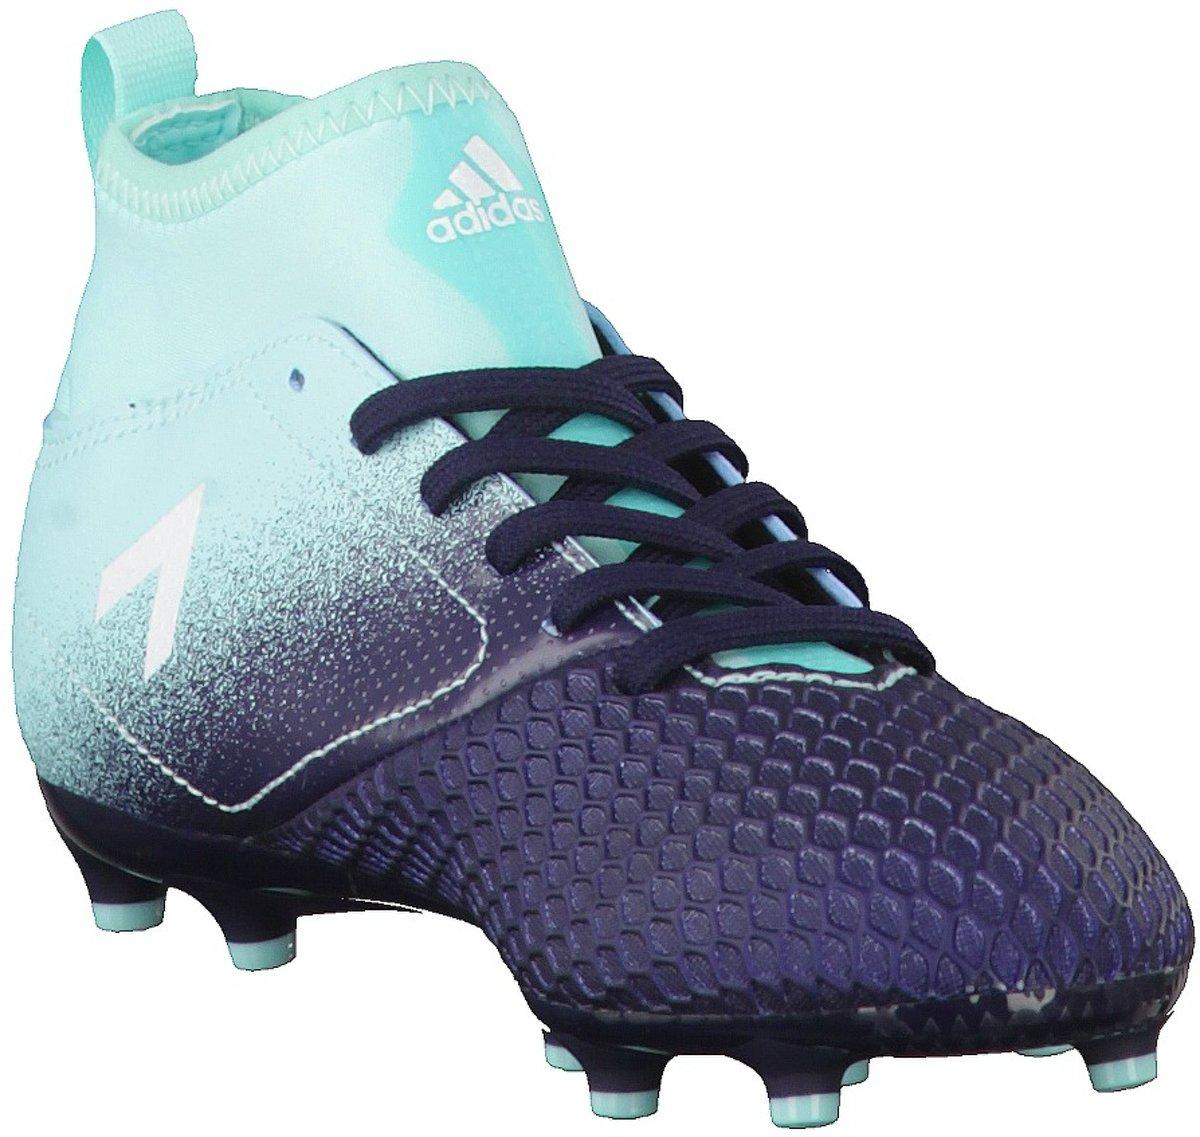 | Adidas Performance Voetbalschoenen ACE 17.3 BA9235